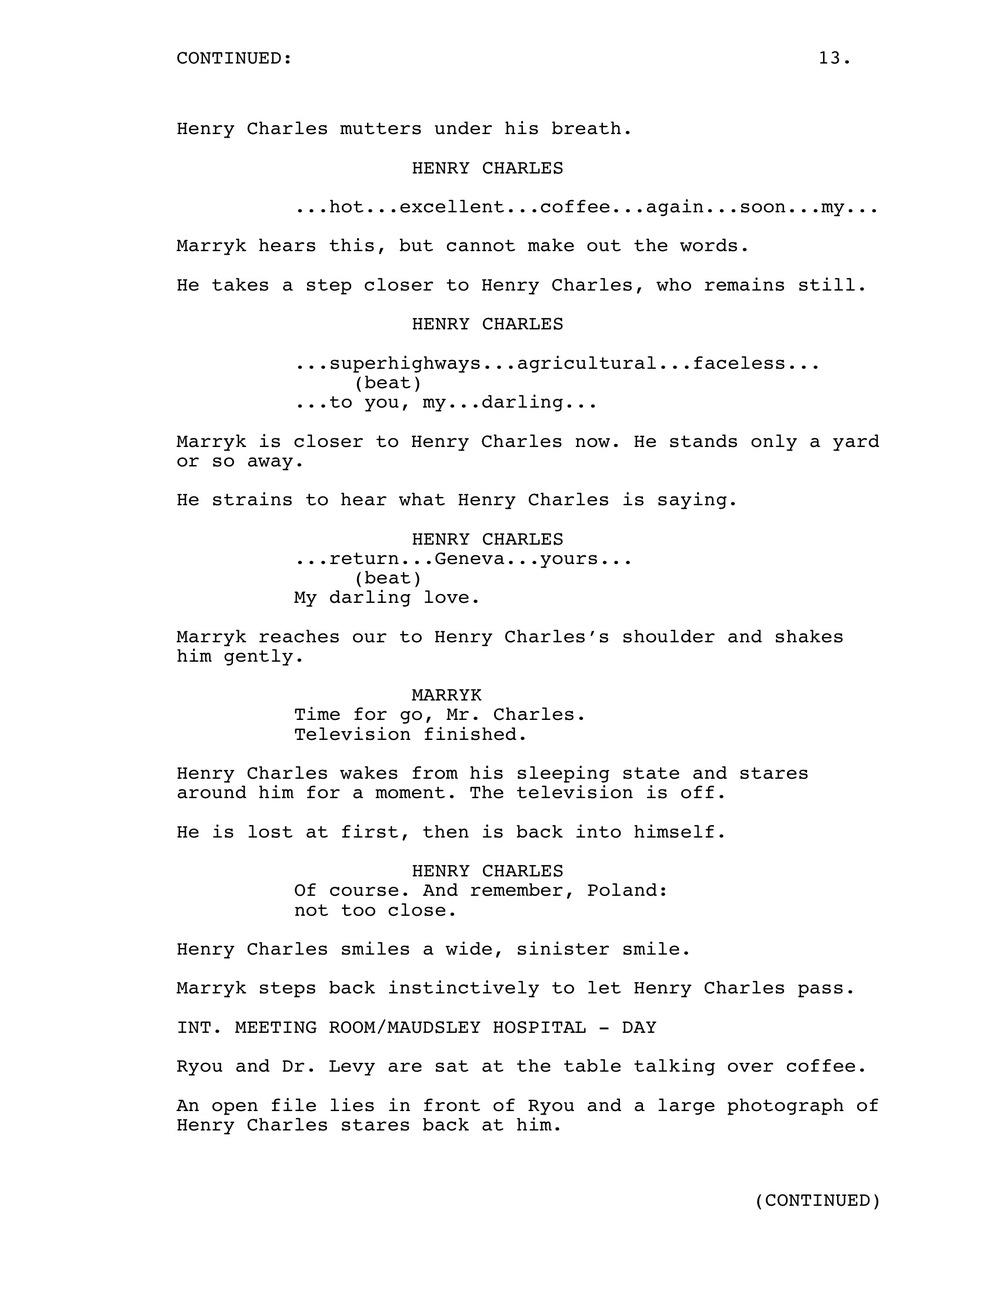 'Introducing Henry Charles' (Pilot) by Alexander Craig | 13.jpeg